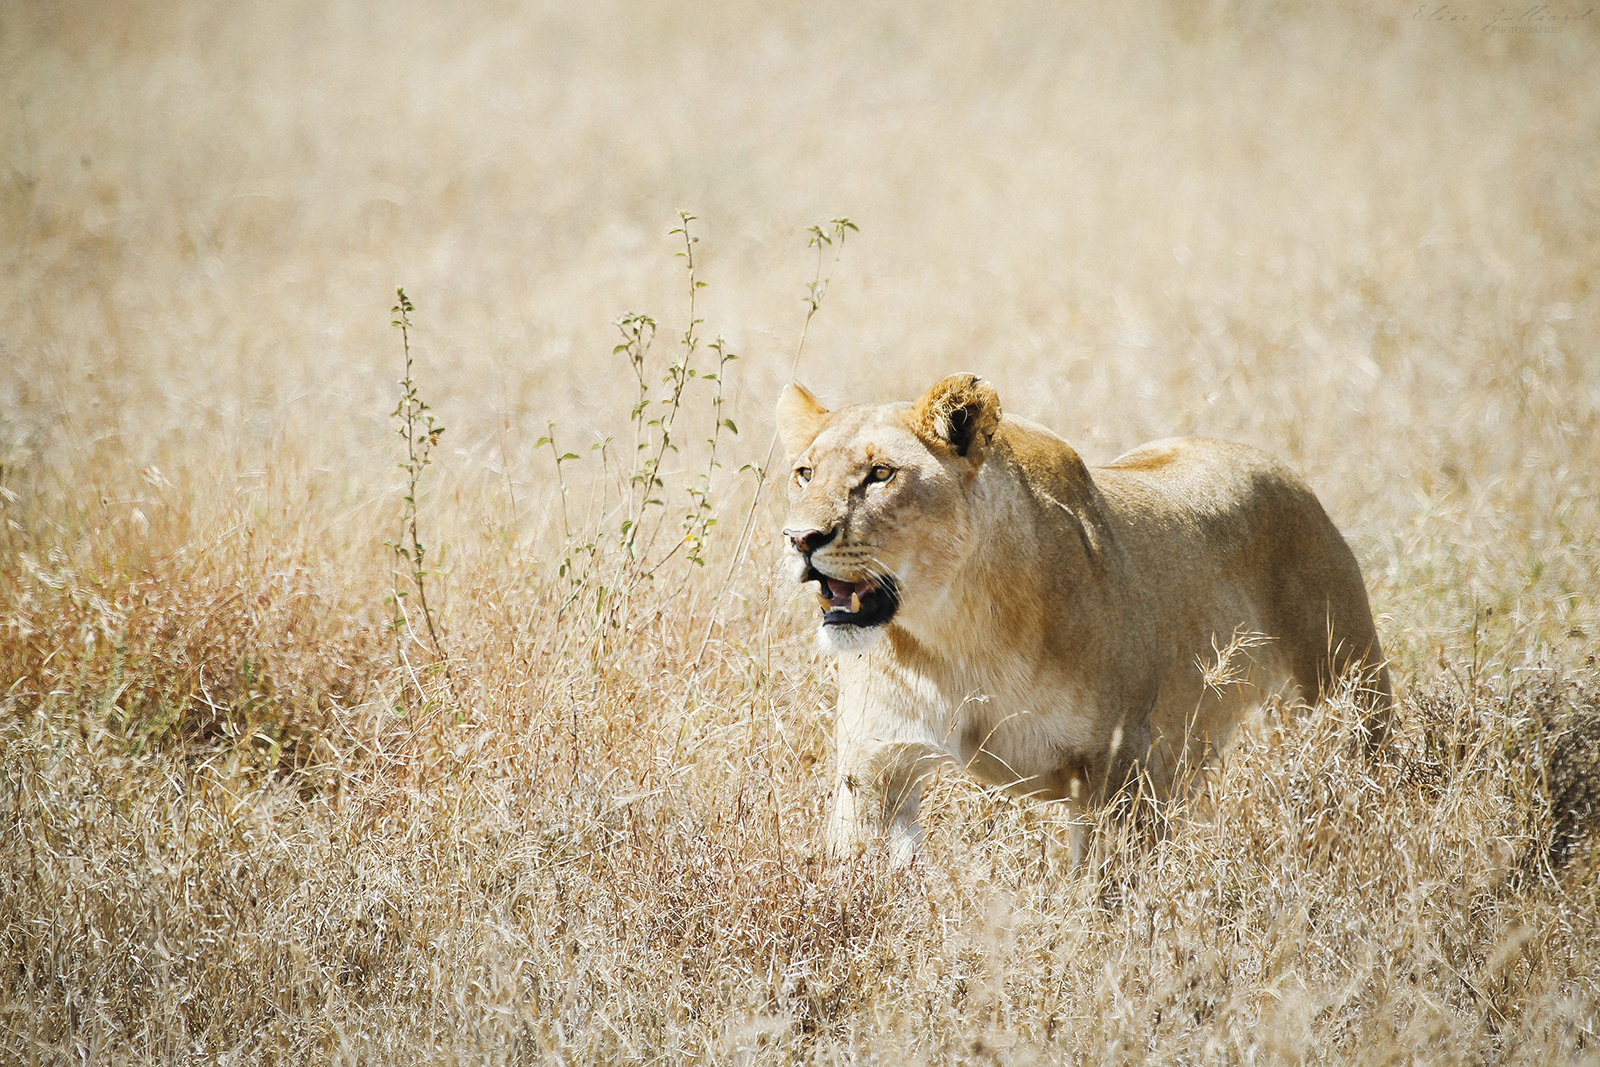 elise-julliard-photographe-tanzanie-lion-lionne-serengeti-national-park-afrique